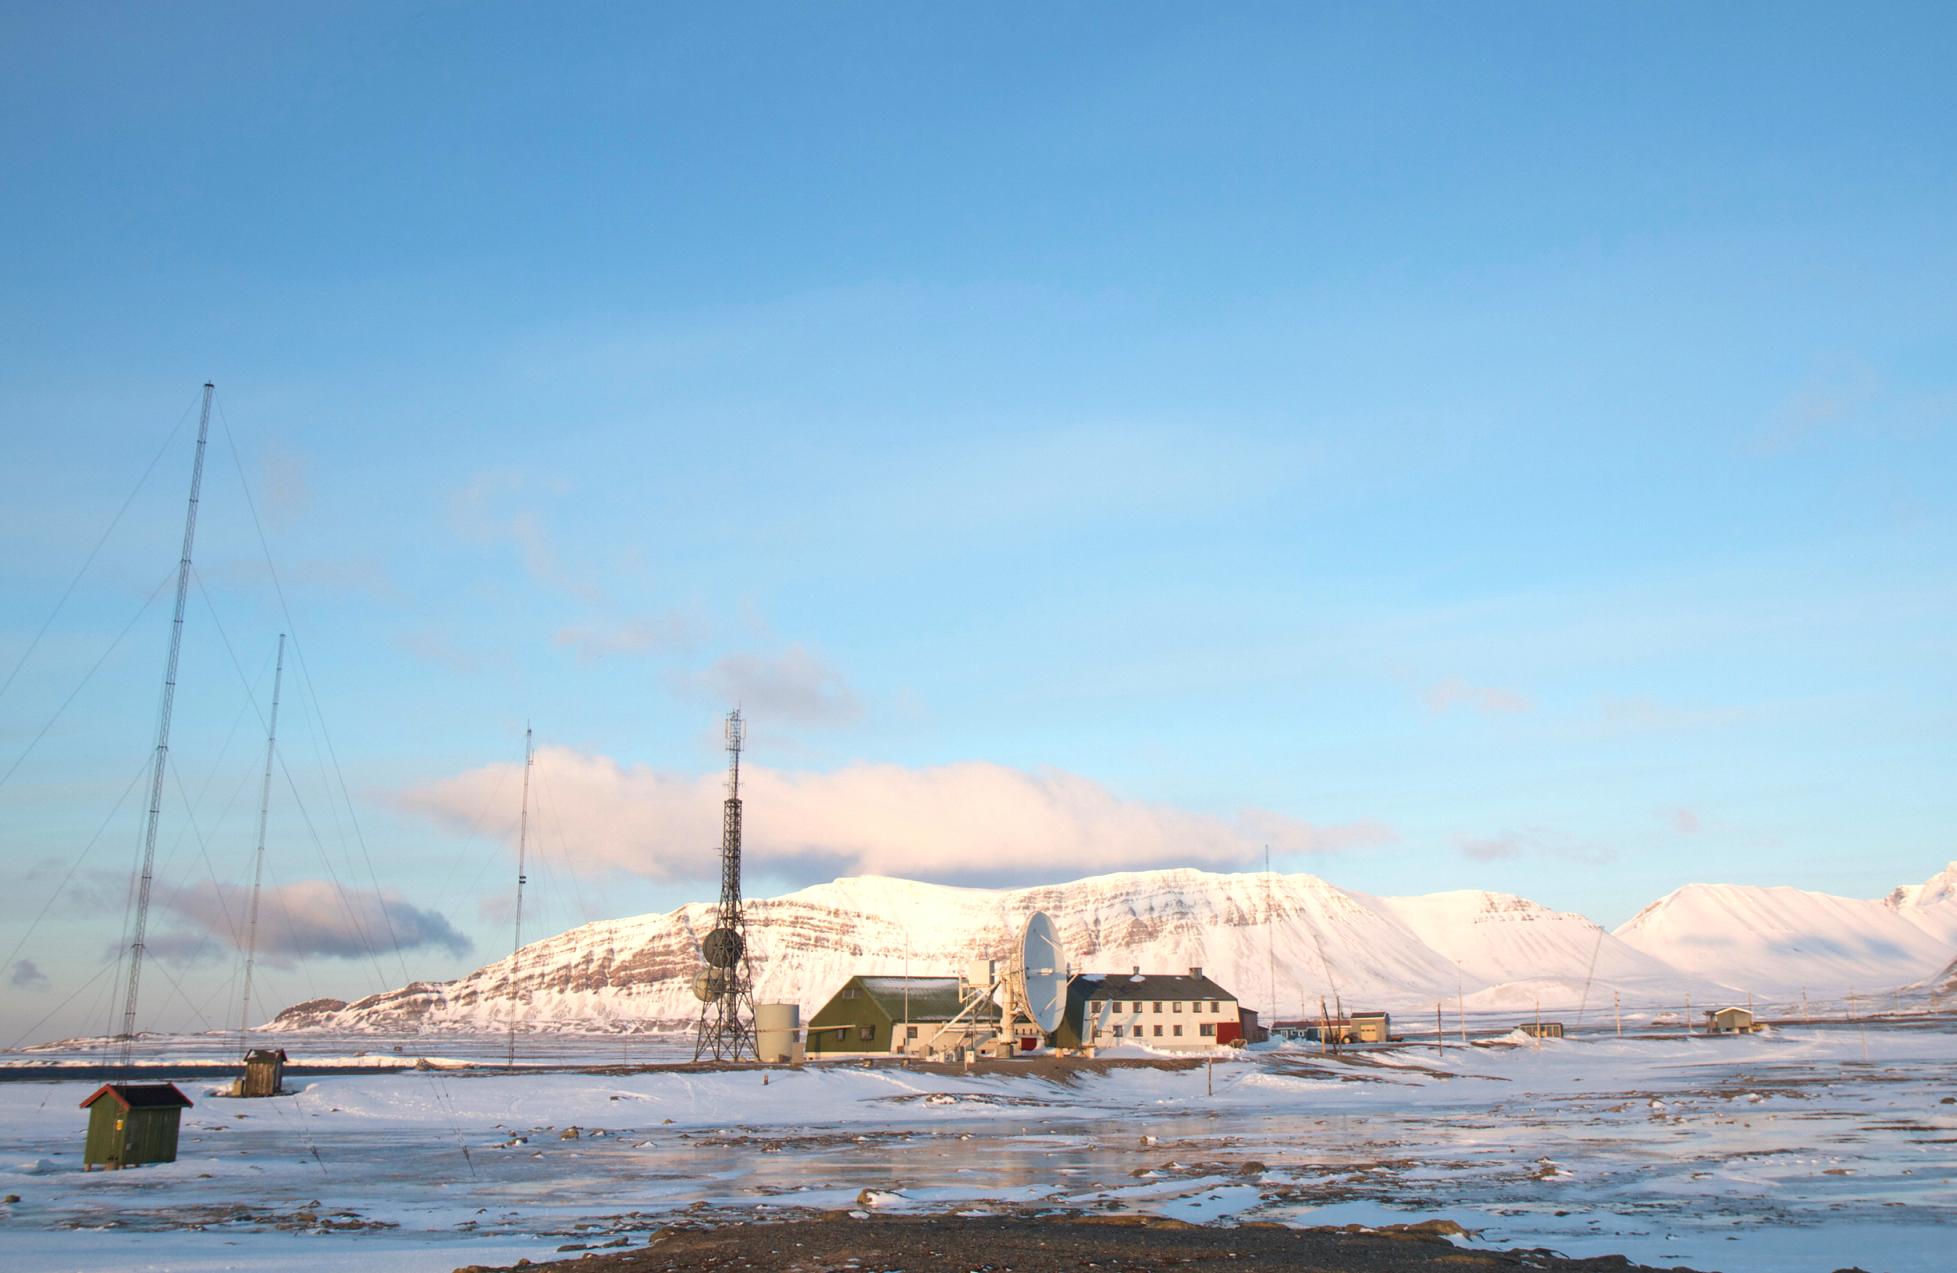 Isfjord Radio, Svalbard. Photograph: Alex Edwards